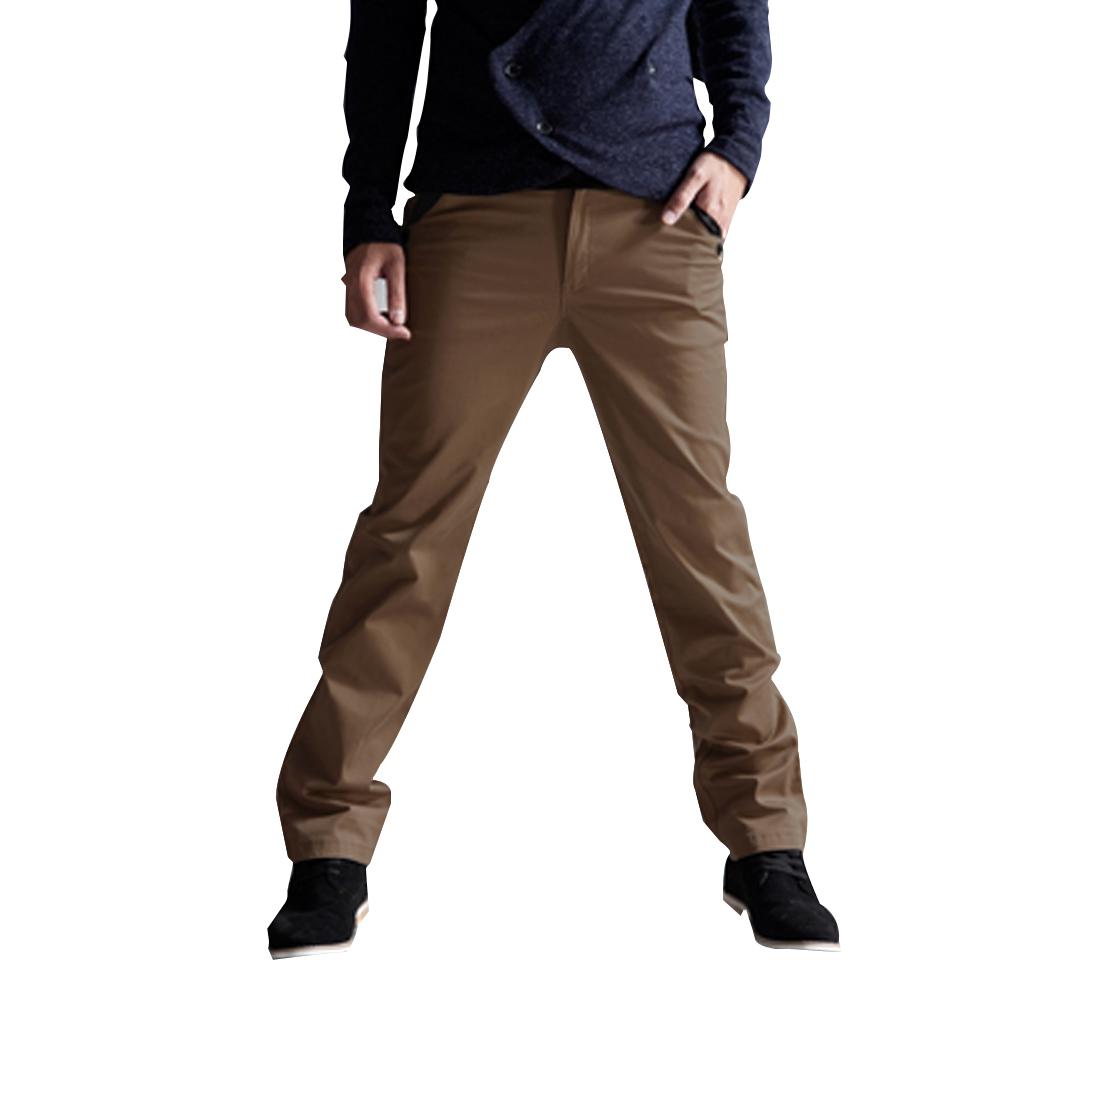 Mens Dark Khaki Stylish Button Closure Pocket Decor Back Pants W30